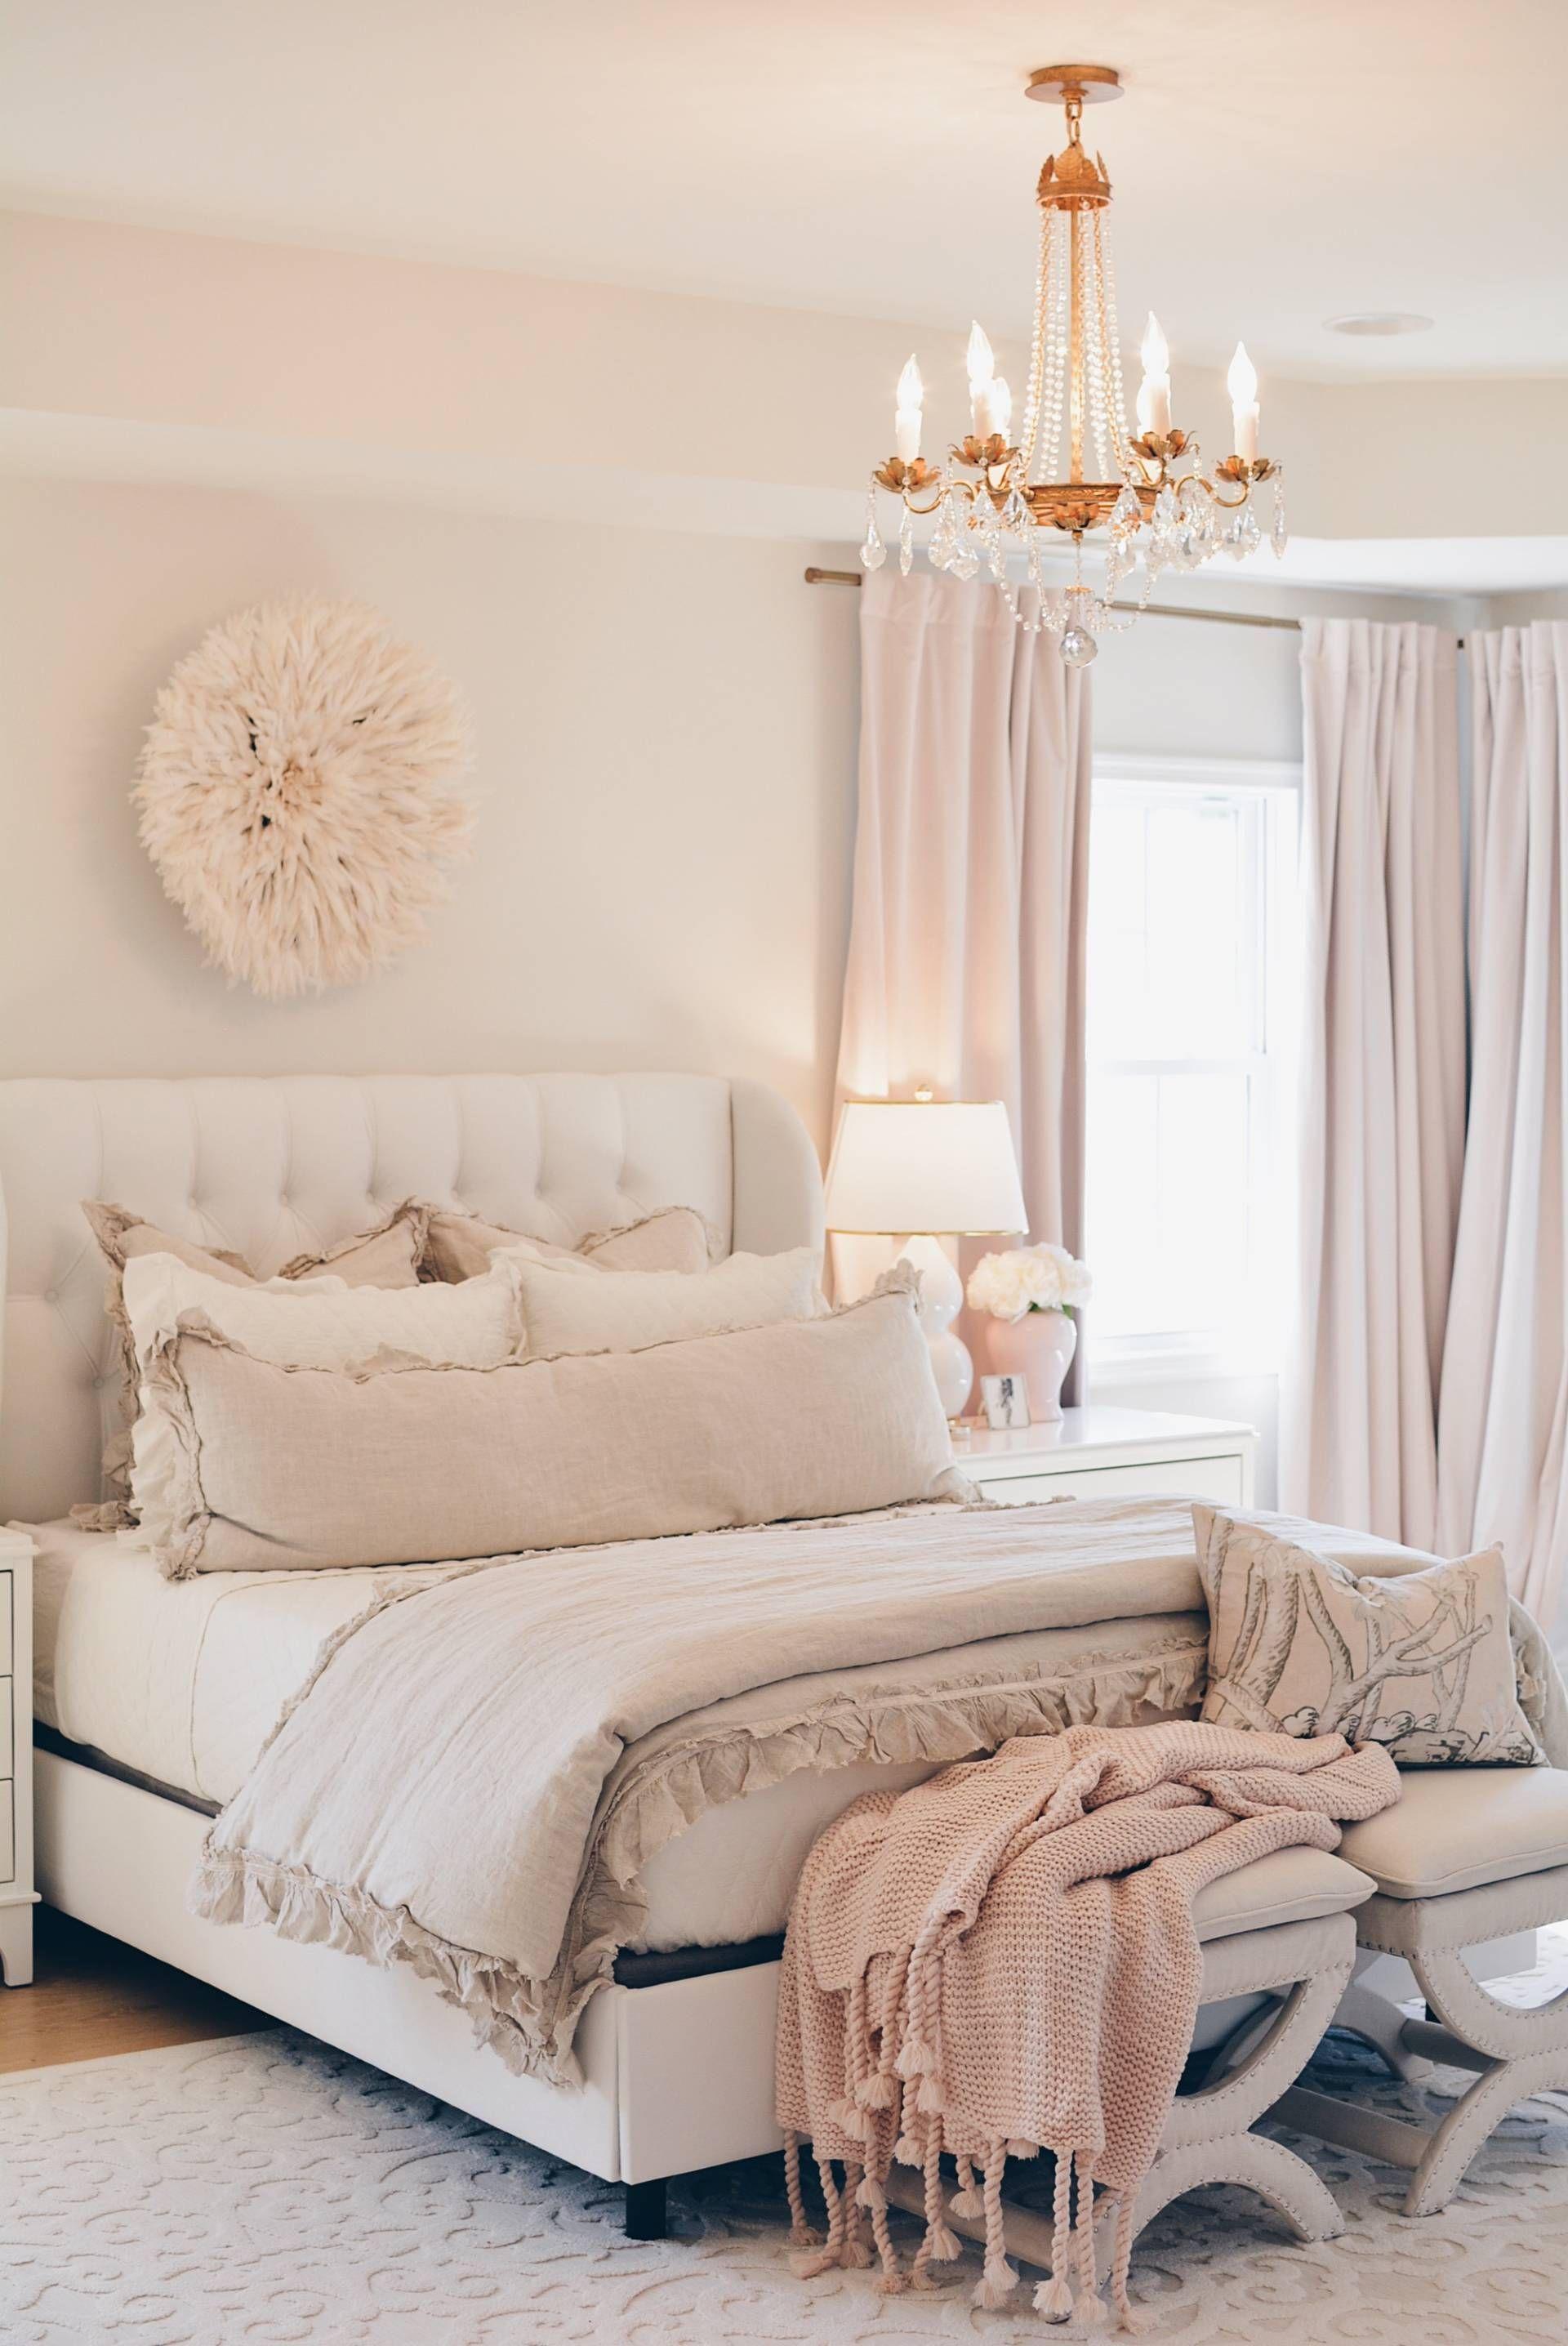 Romantic Red Bedroom Ideas: Master Bedroom Decor: A Cozy & Romantic Master Bedroom